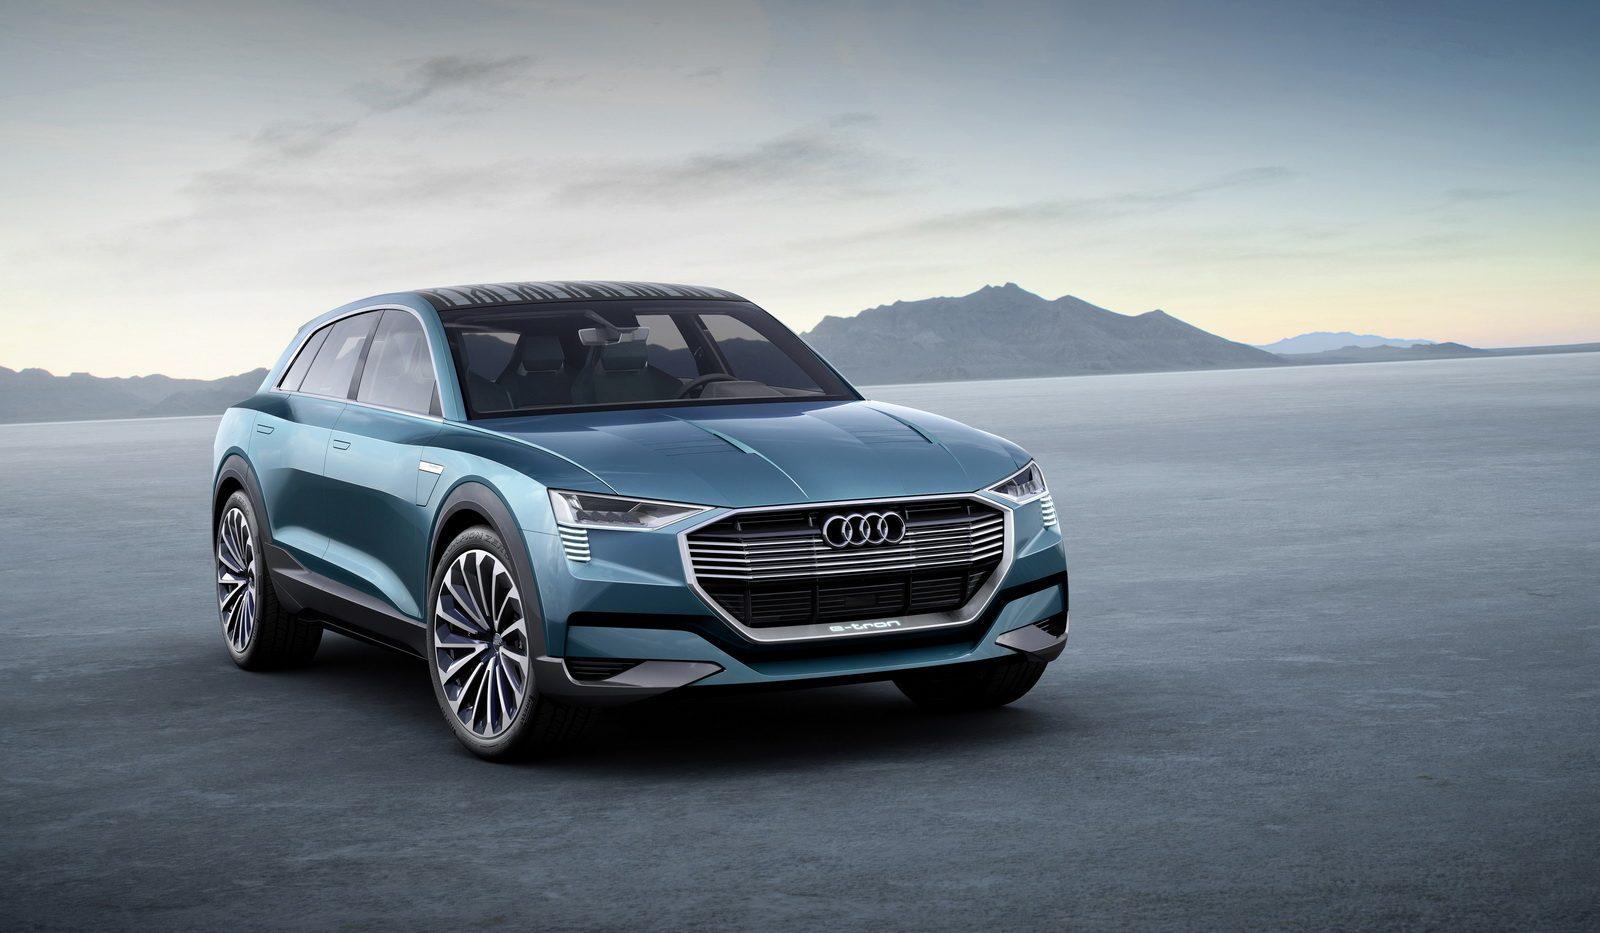 Audi-e-tron-quattro-01.jpg